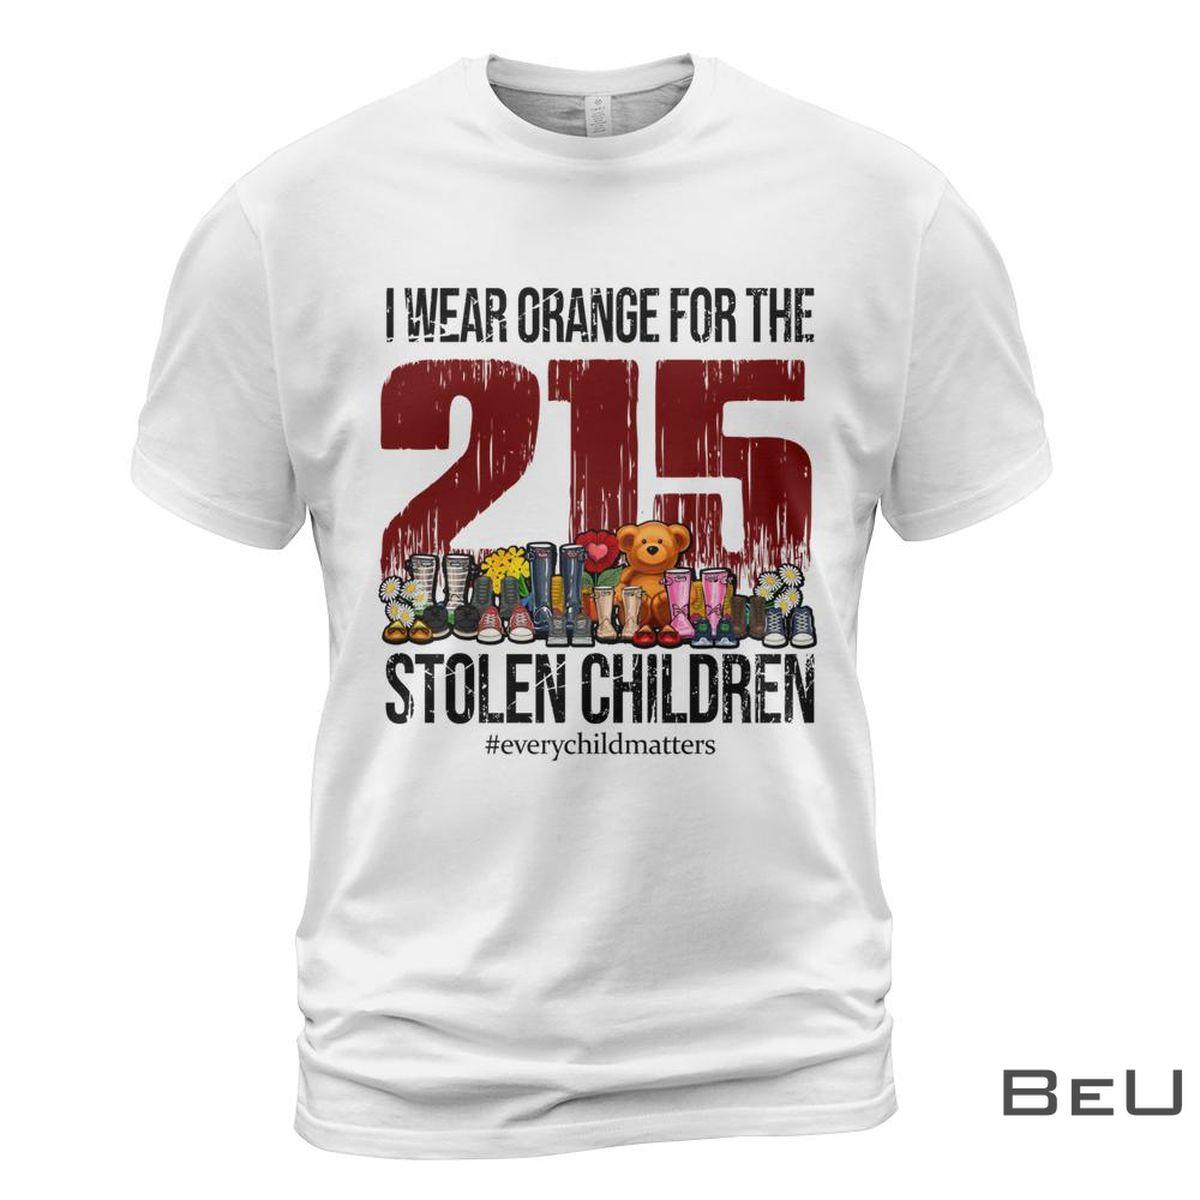 I Wear Orange For The Stolen Children Shirt